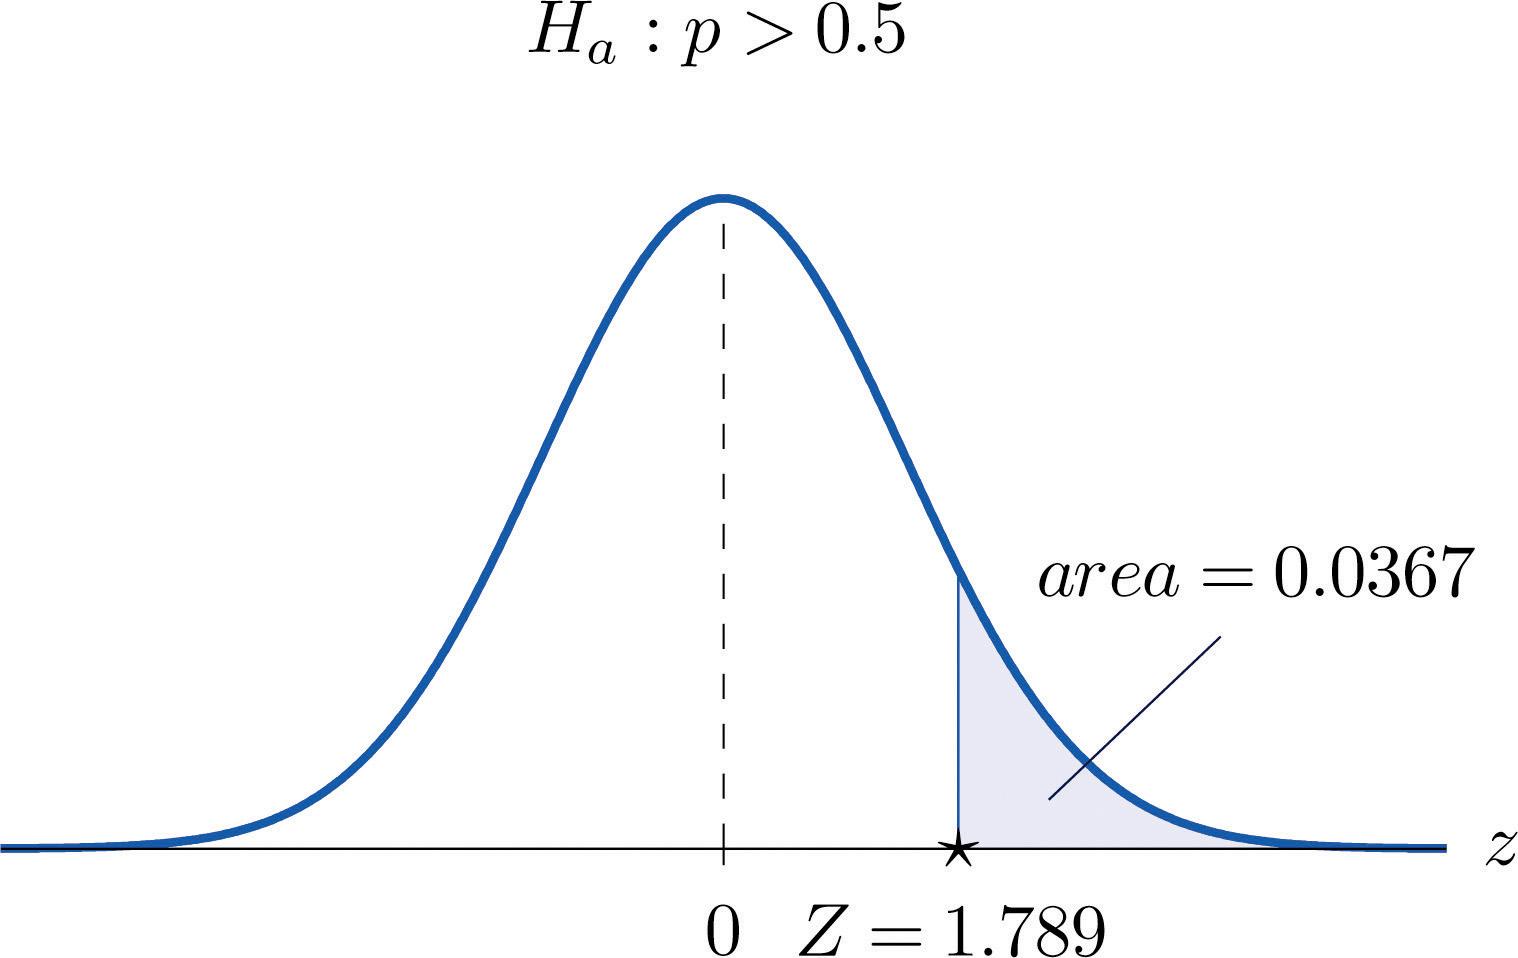 Large Sample Tests for a Population Proportion